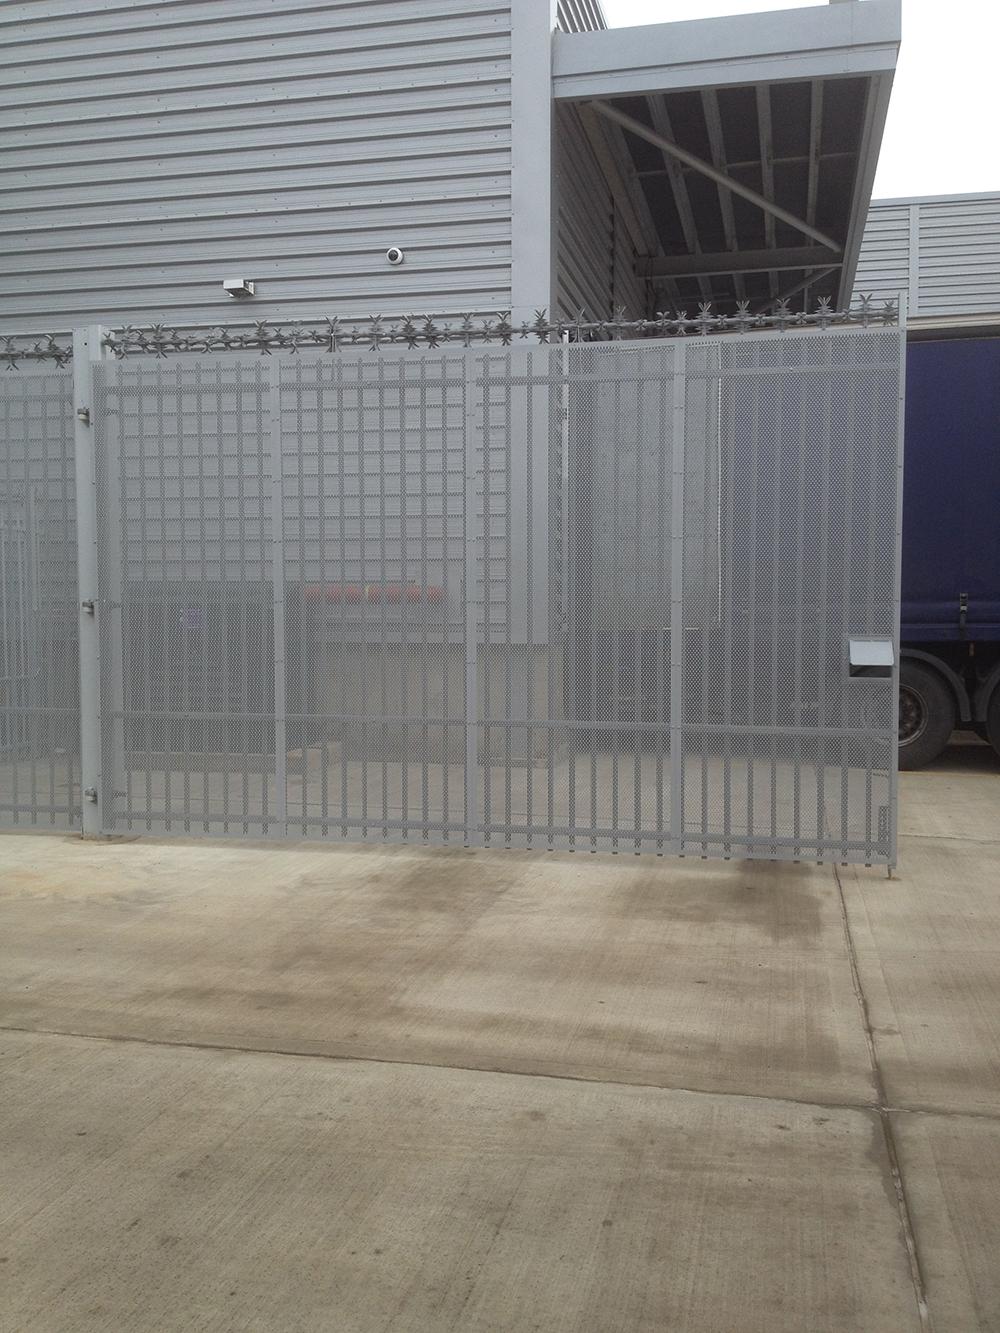 Mesh over clad gates